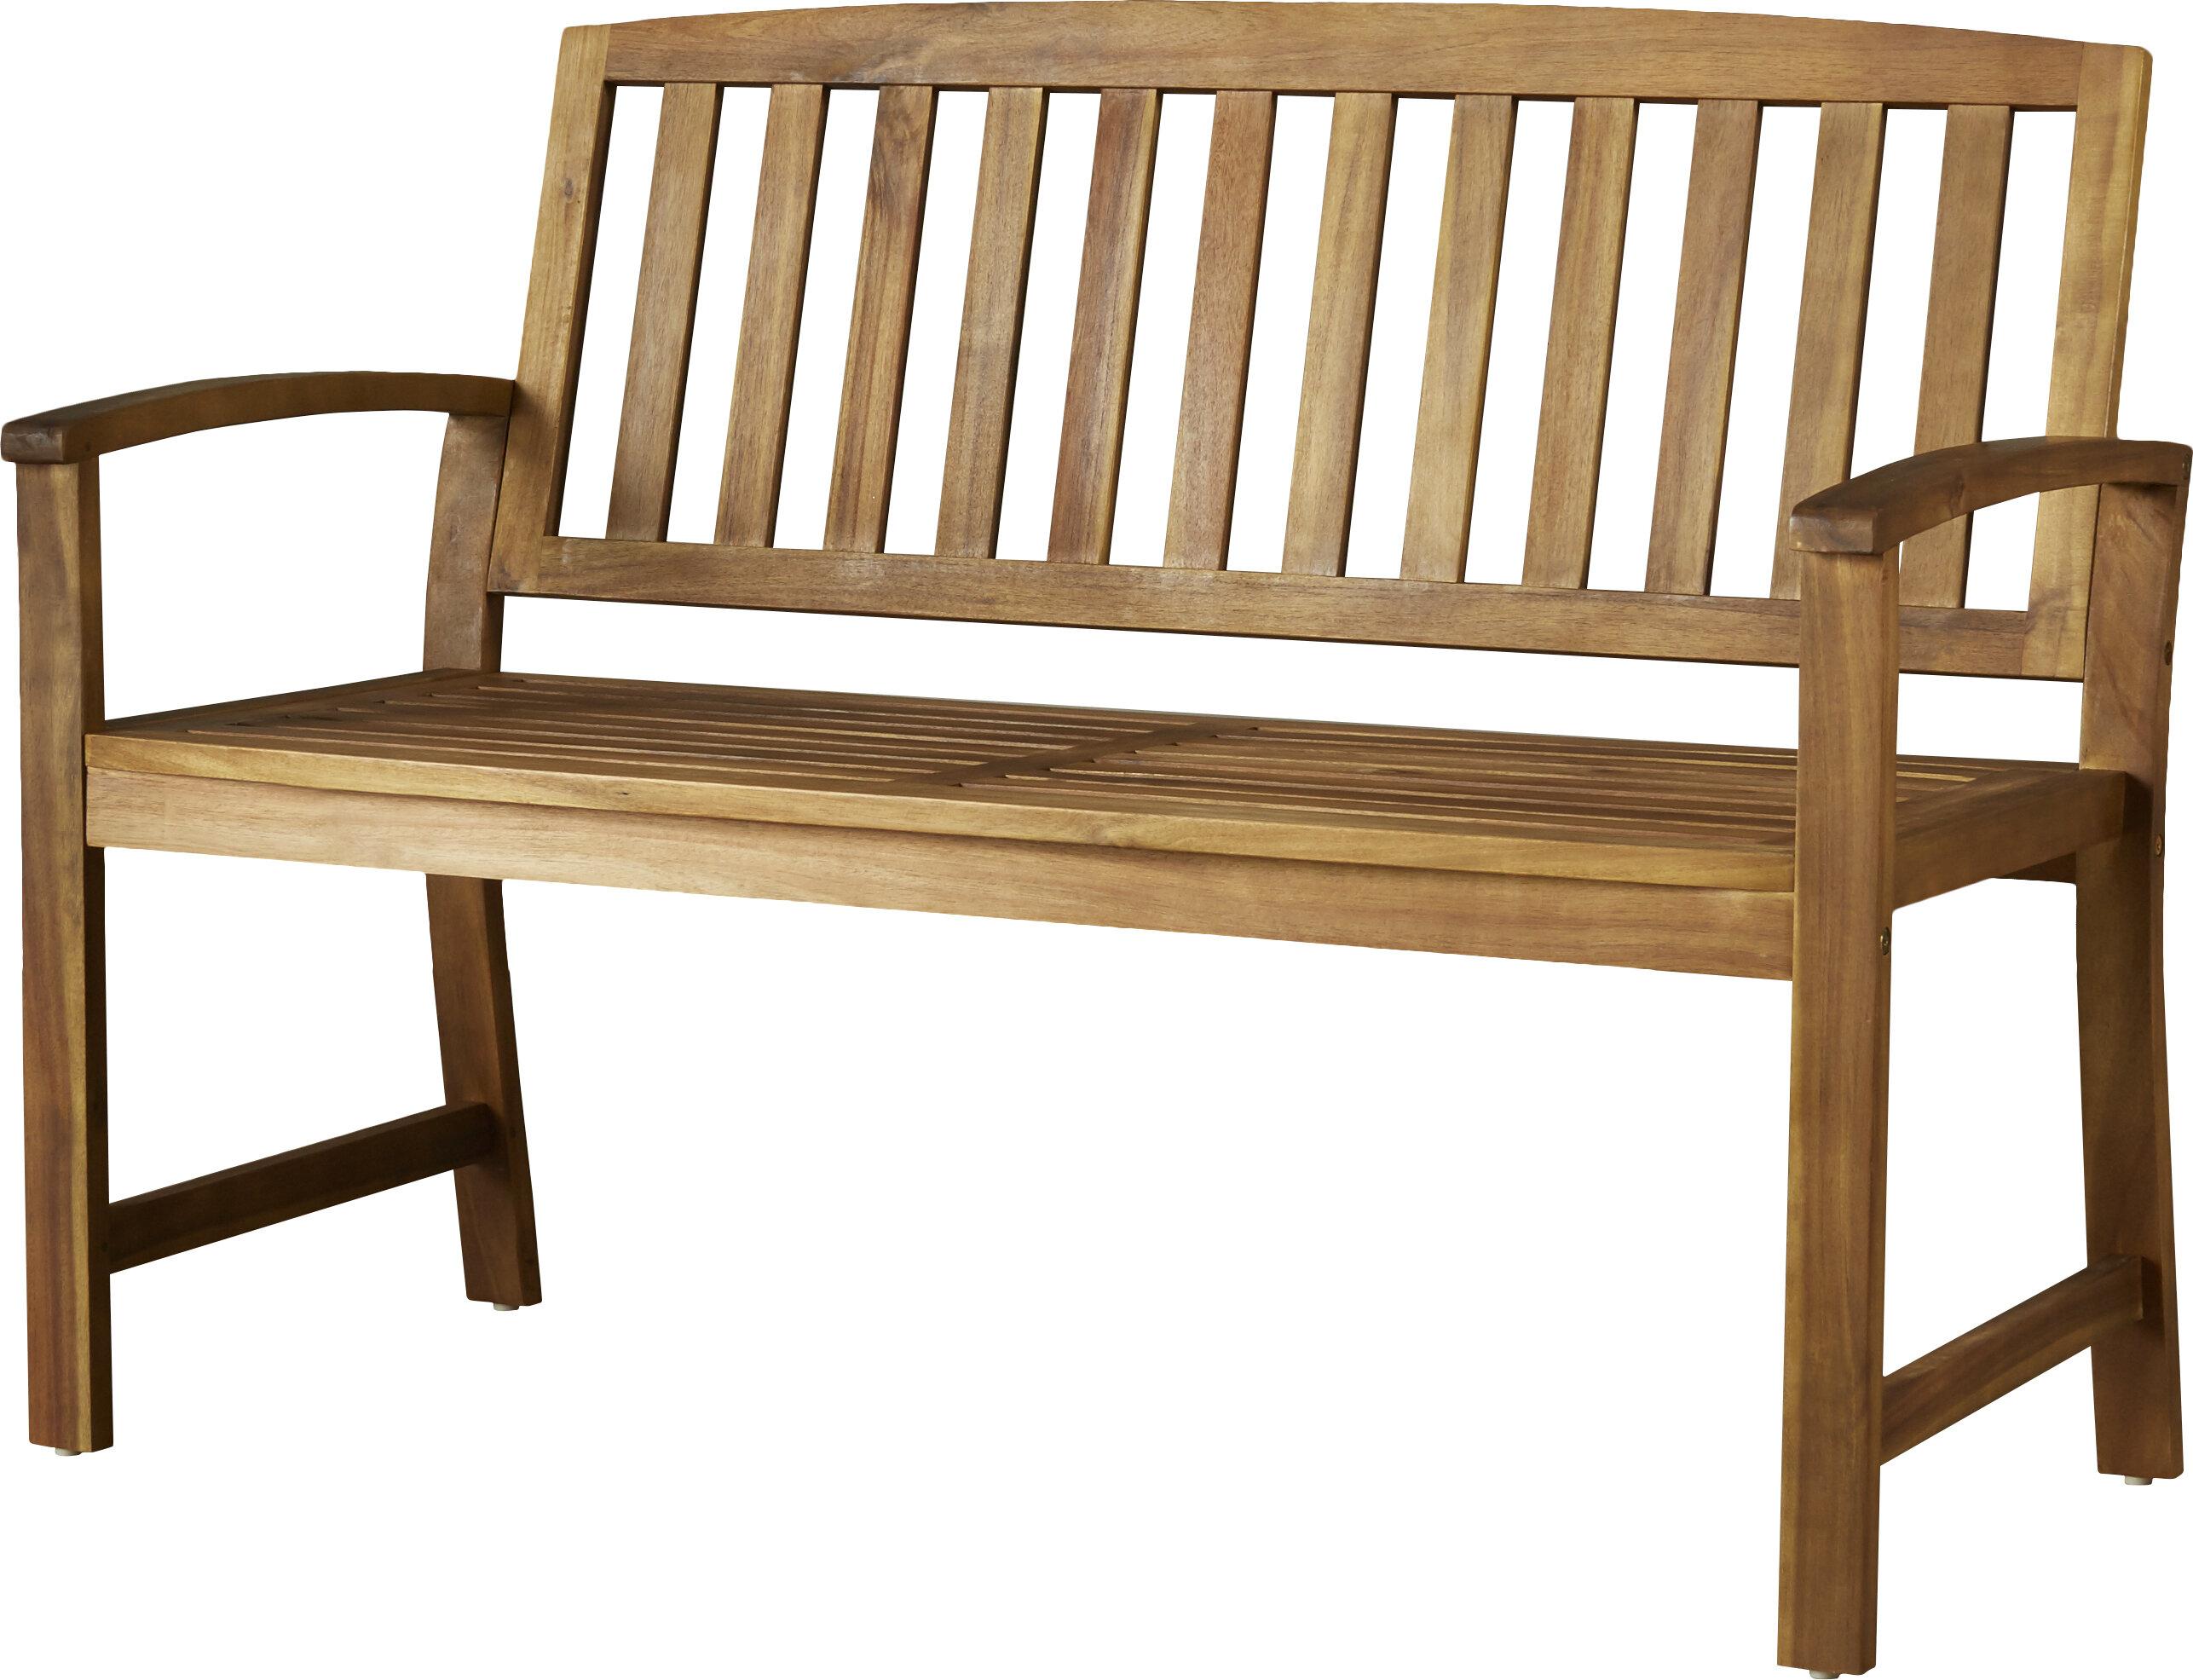 Leora Acacia Wood Garden Bench Reviews Joss Main